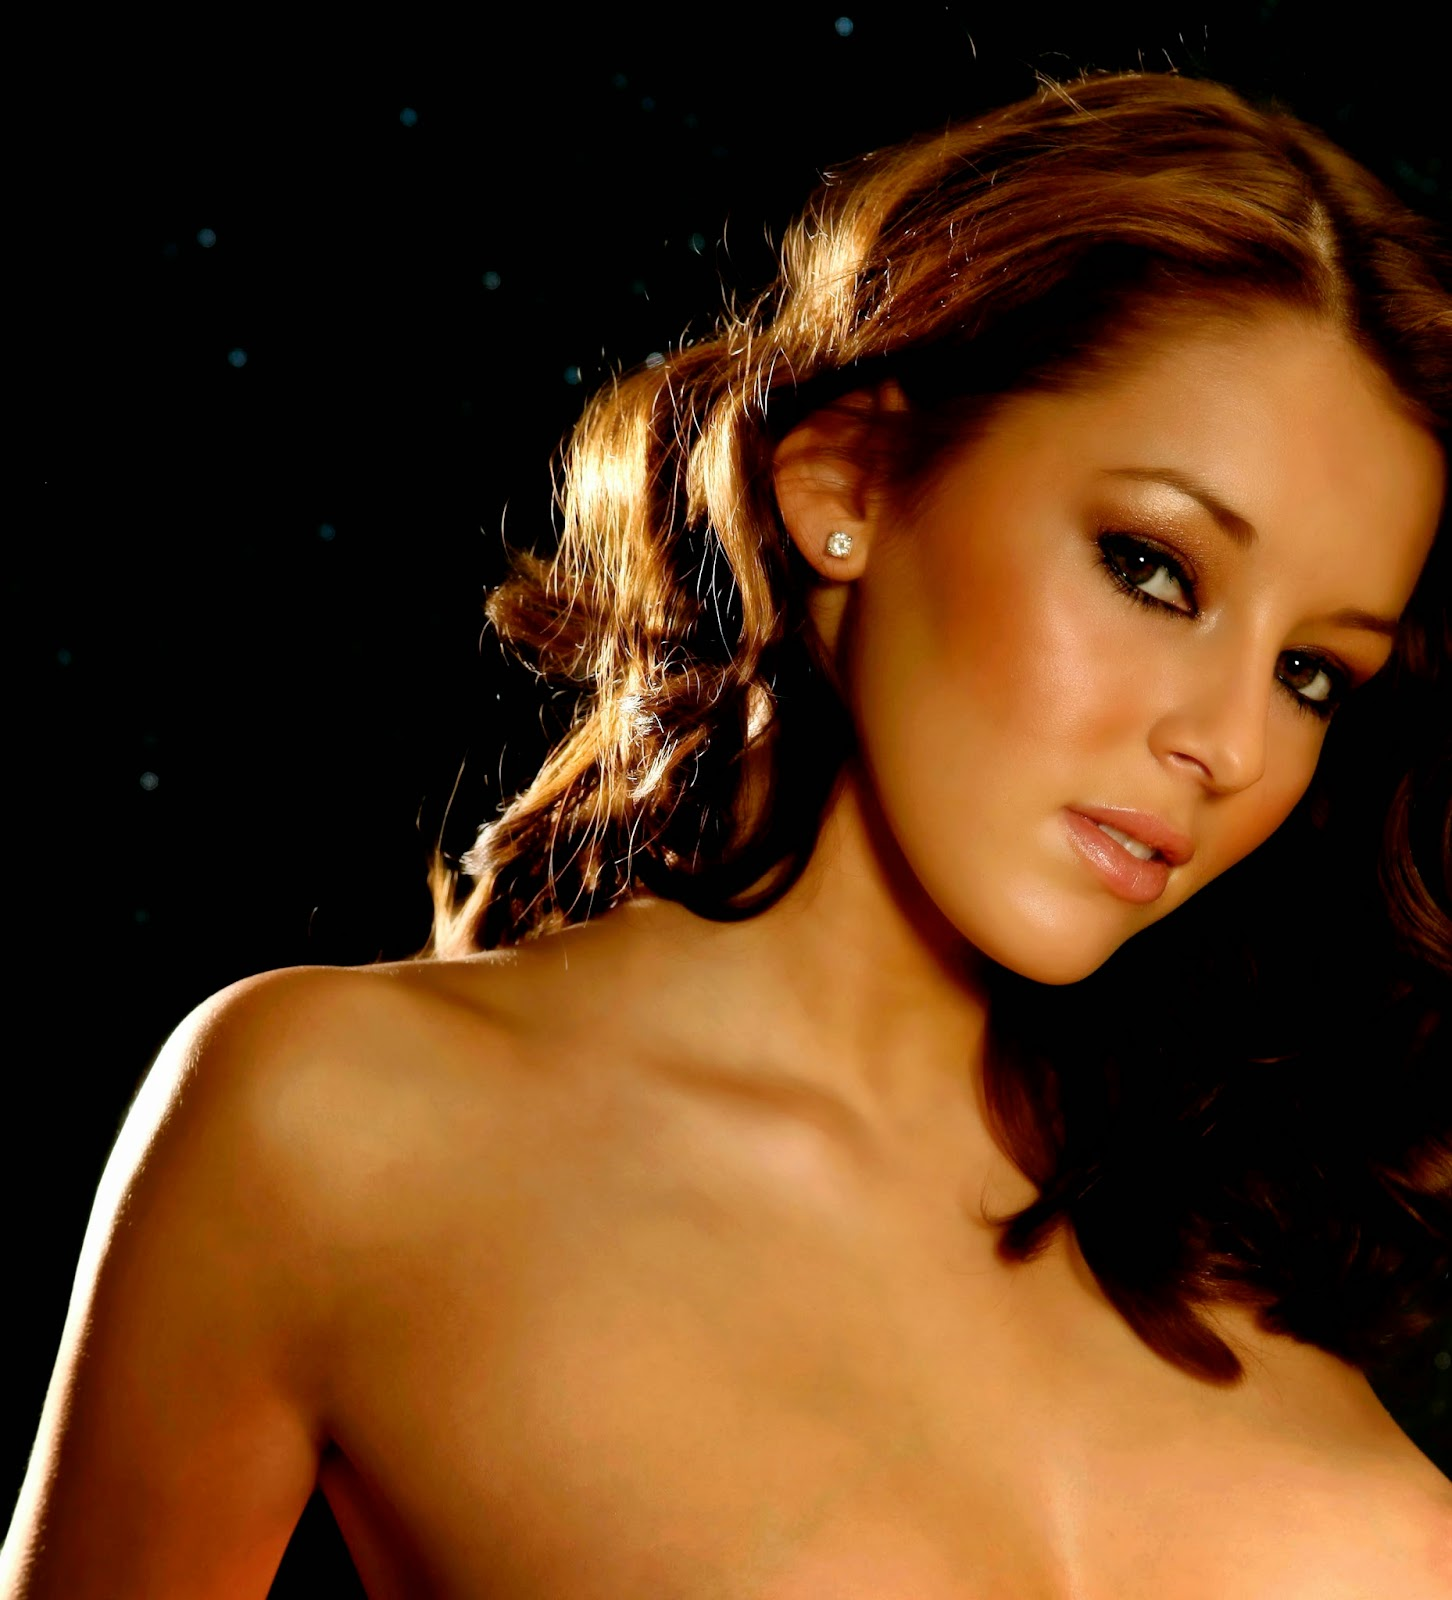 Philippines virgin girl nude